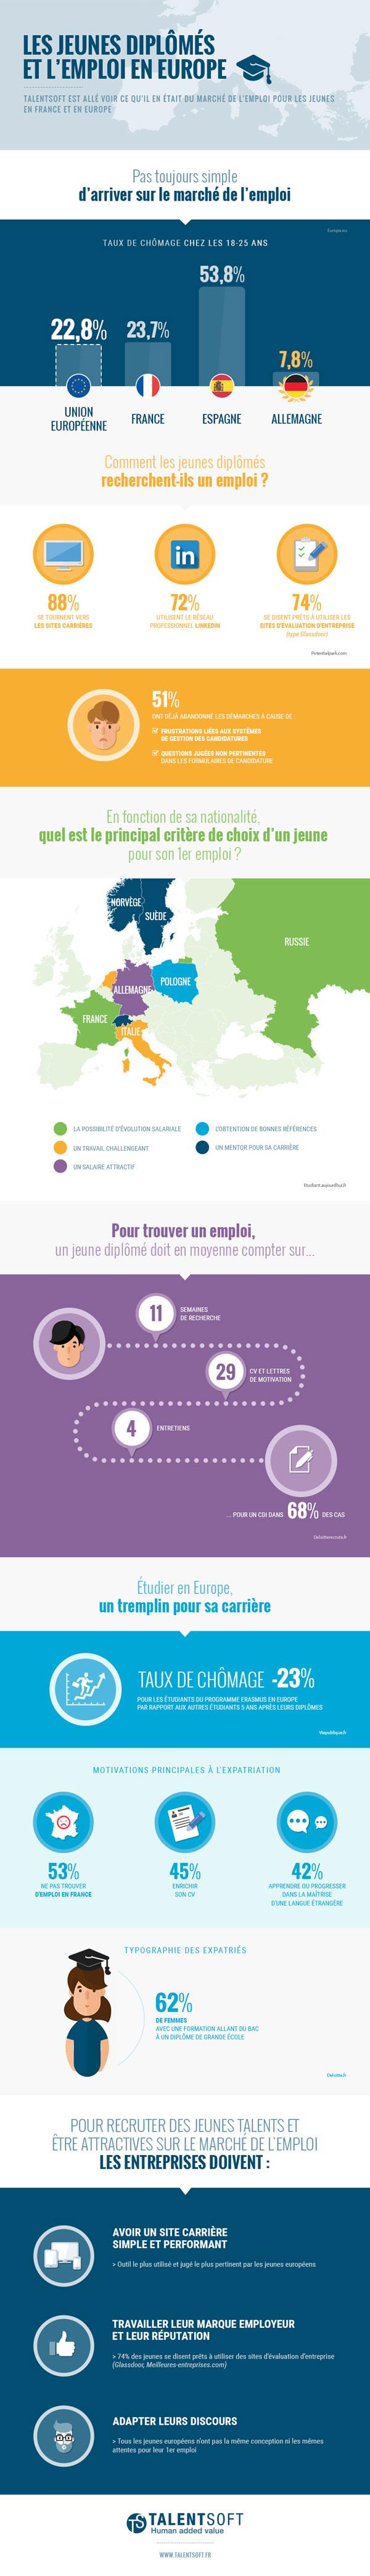 infographie-jeunes-diplomes_2015